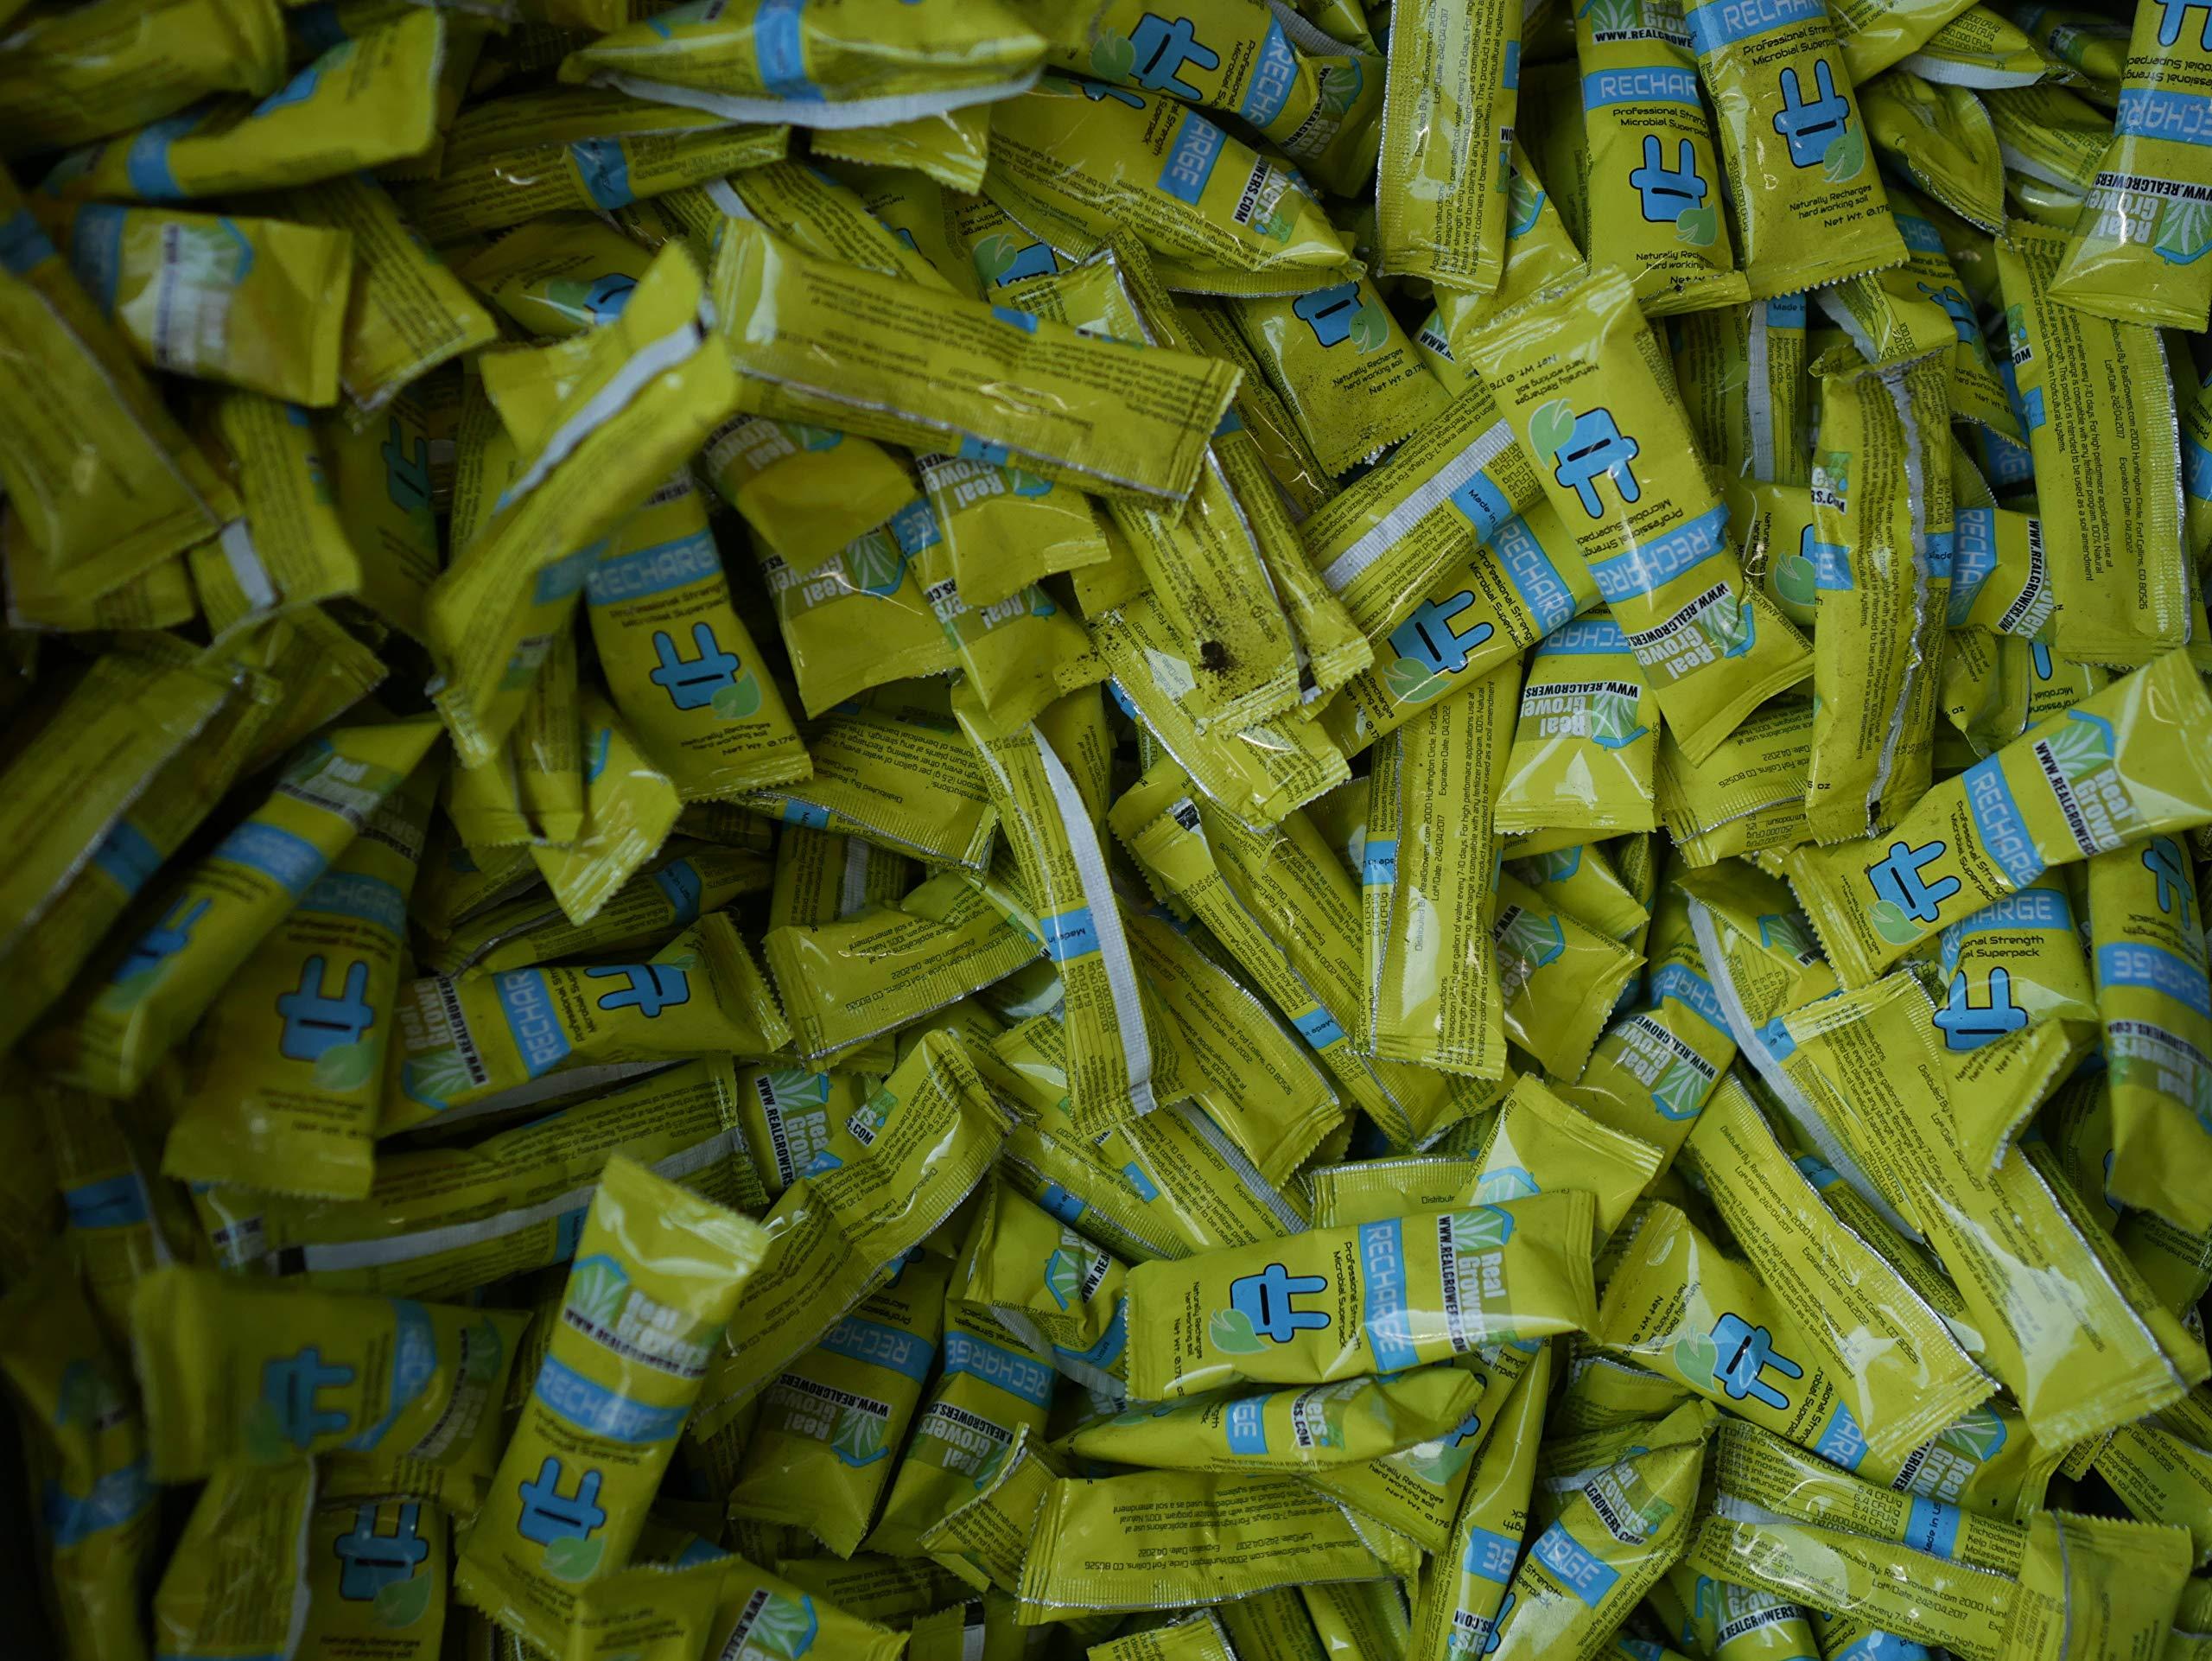 Pack of 3 Recharge Biofertilizer Stick Packs Plus 2 Bonus Sticks